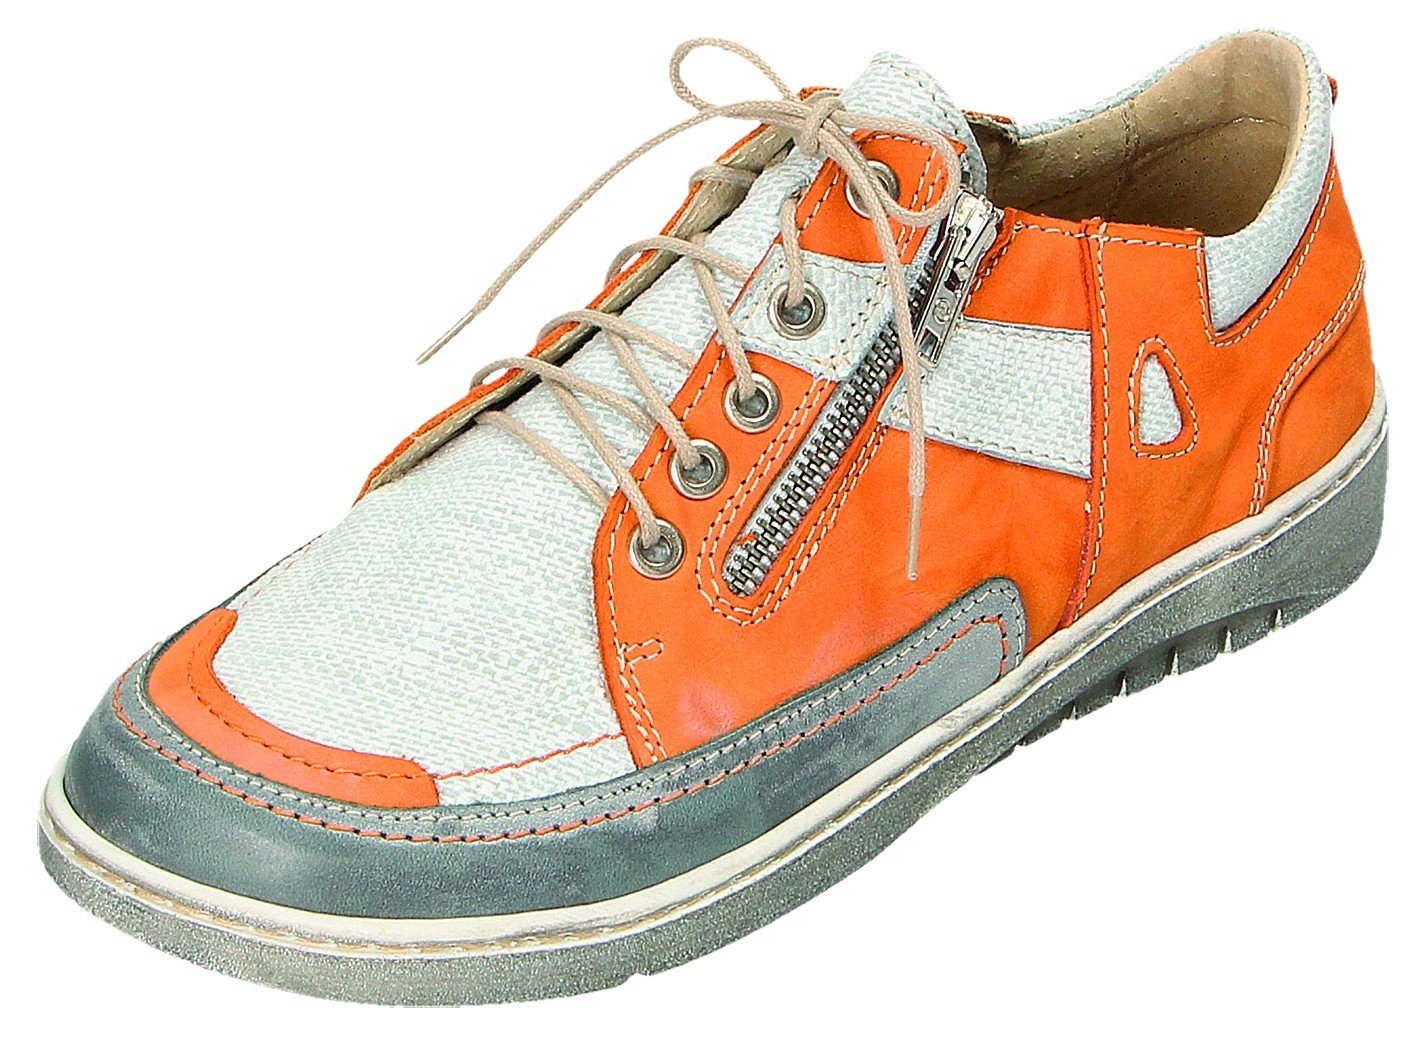 MICCOS Zapatos de Cordones Para Mujer Naranja Orange/Komb. 37 EU|orange/komb.